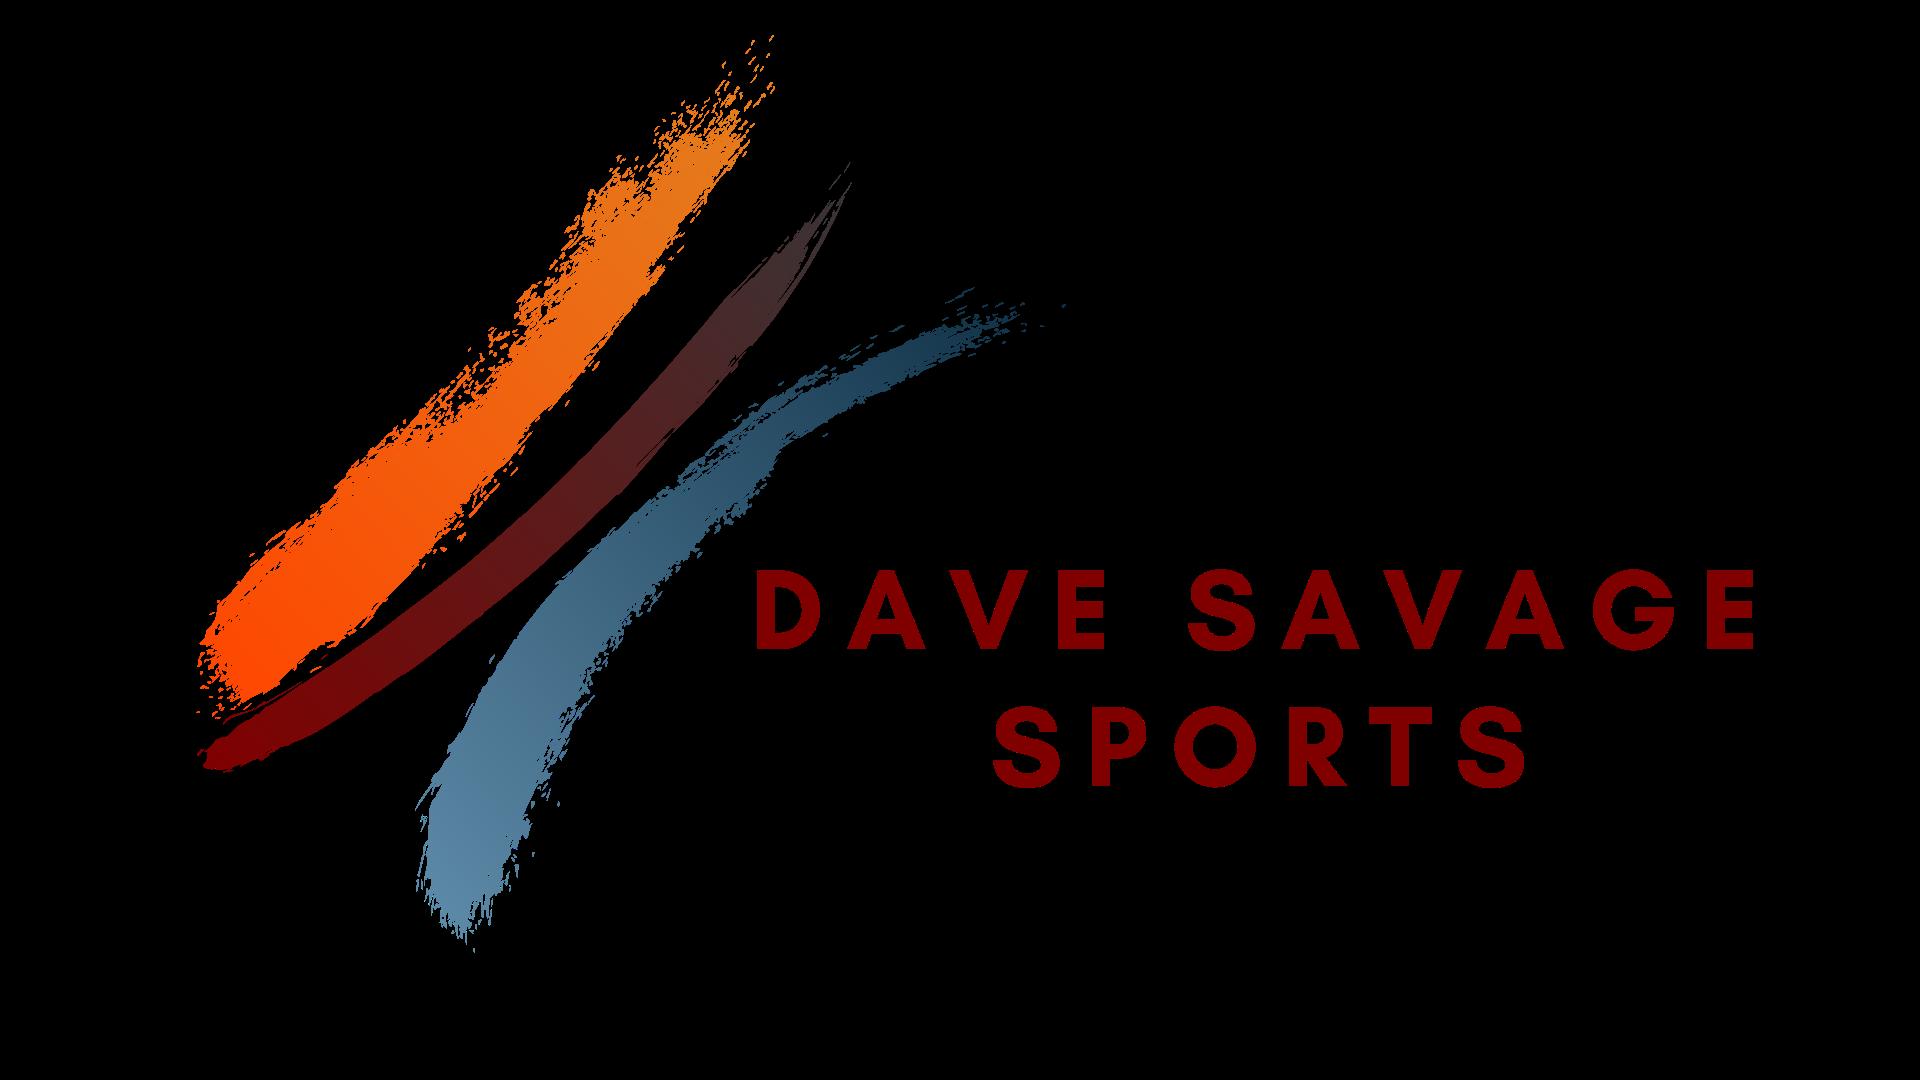 Dave Savage Sports